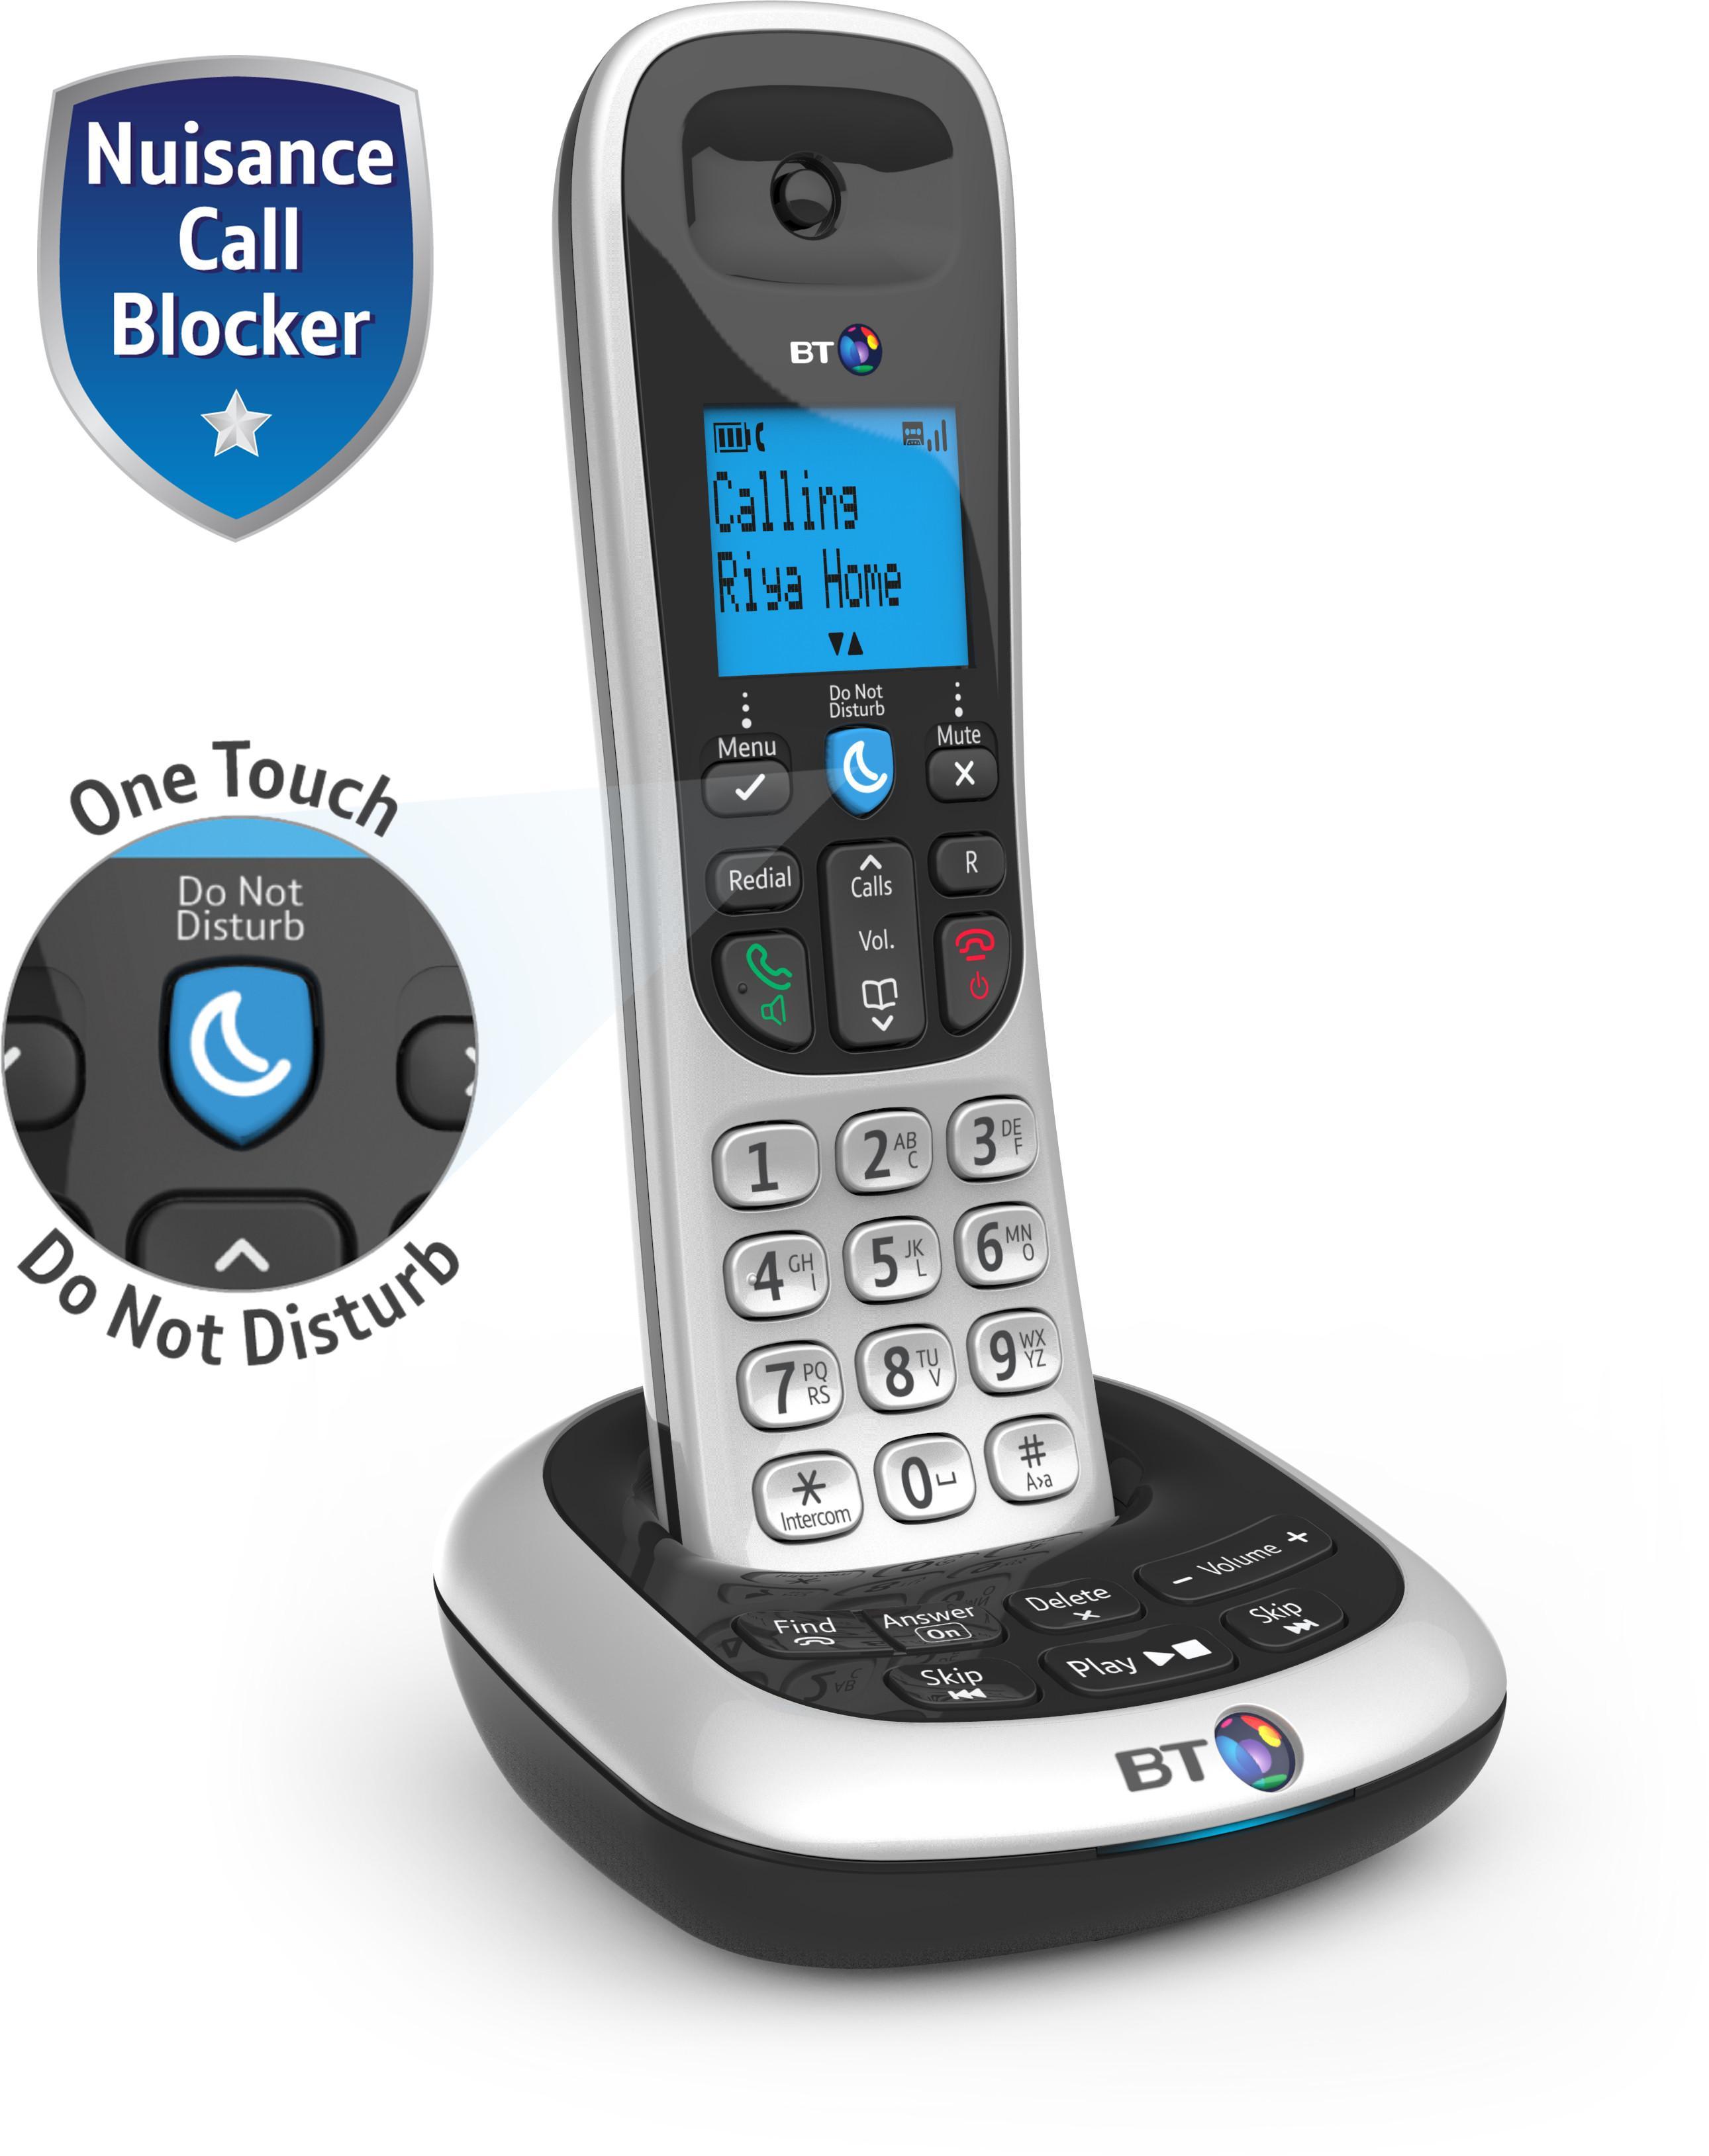 Designer Home Phones Edepremcom - Designer home phones